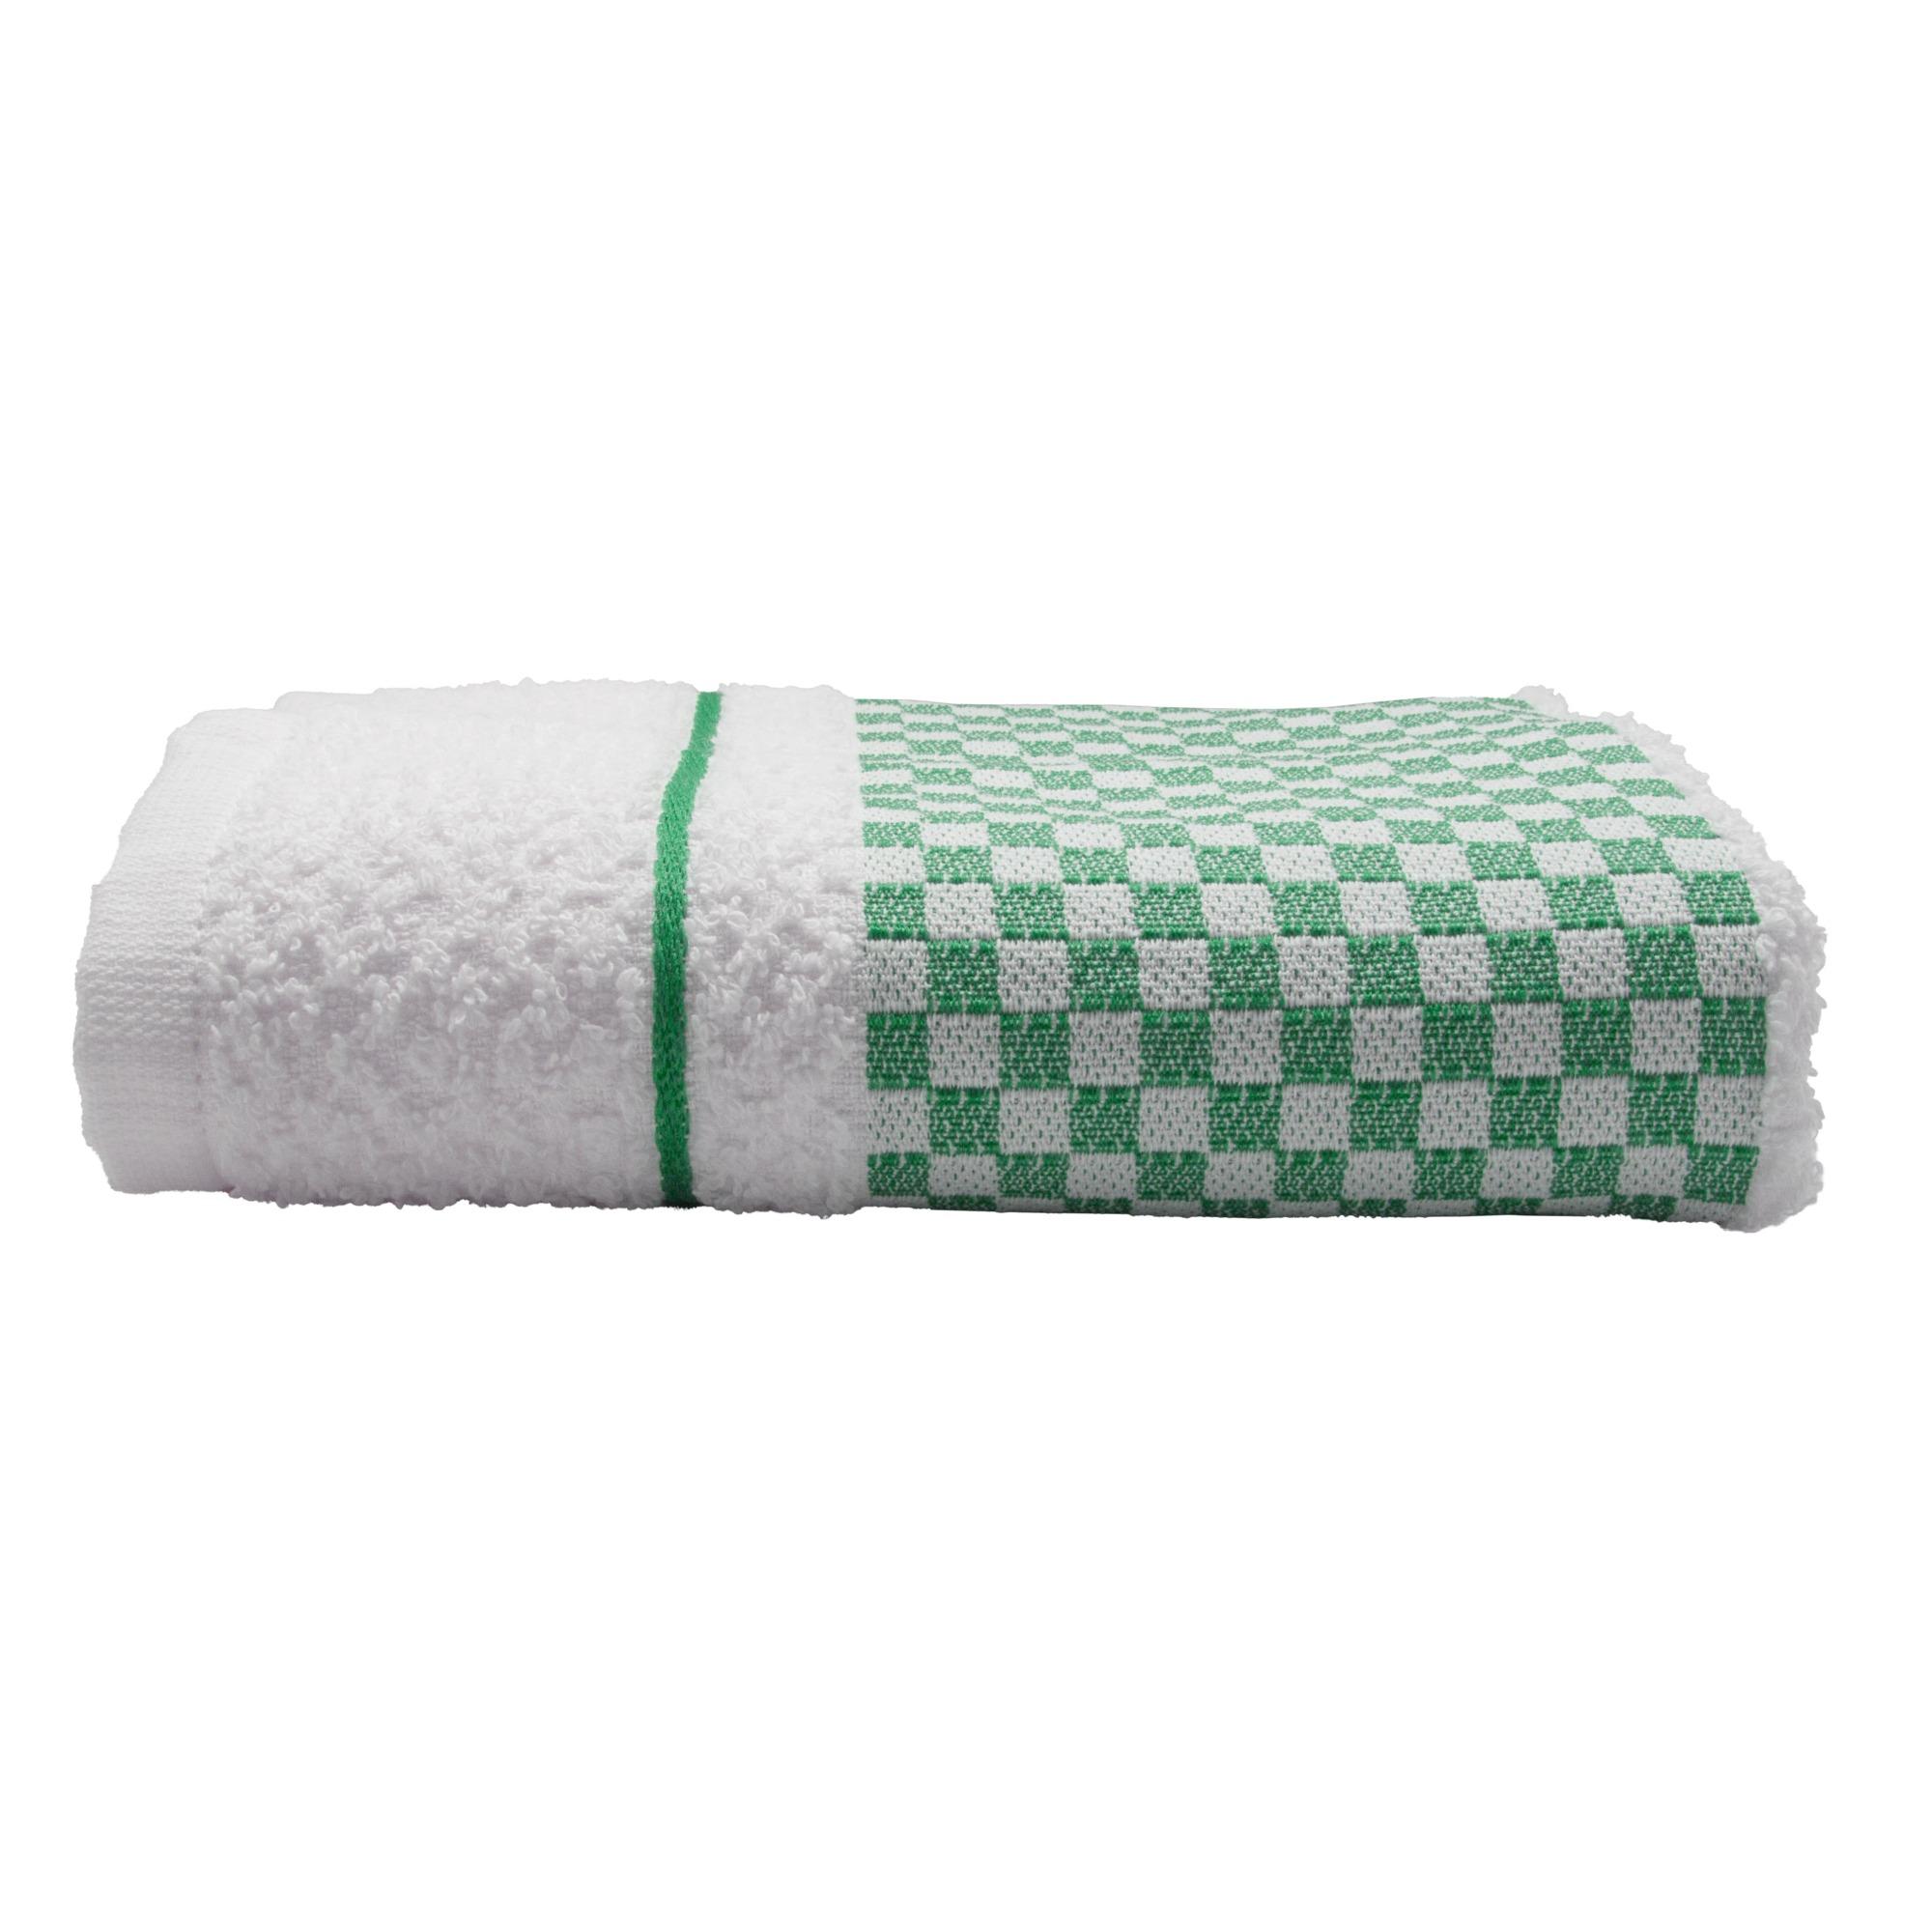 Pano de Copa Jacquard Vitoria Liso 45 x 70cm Verde - Dohler